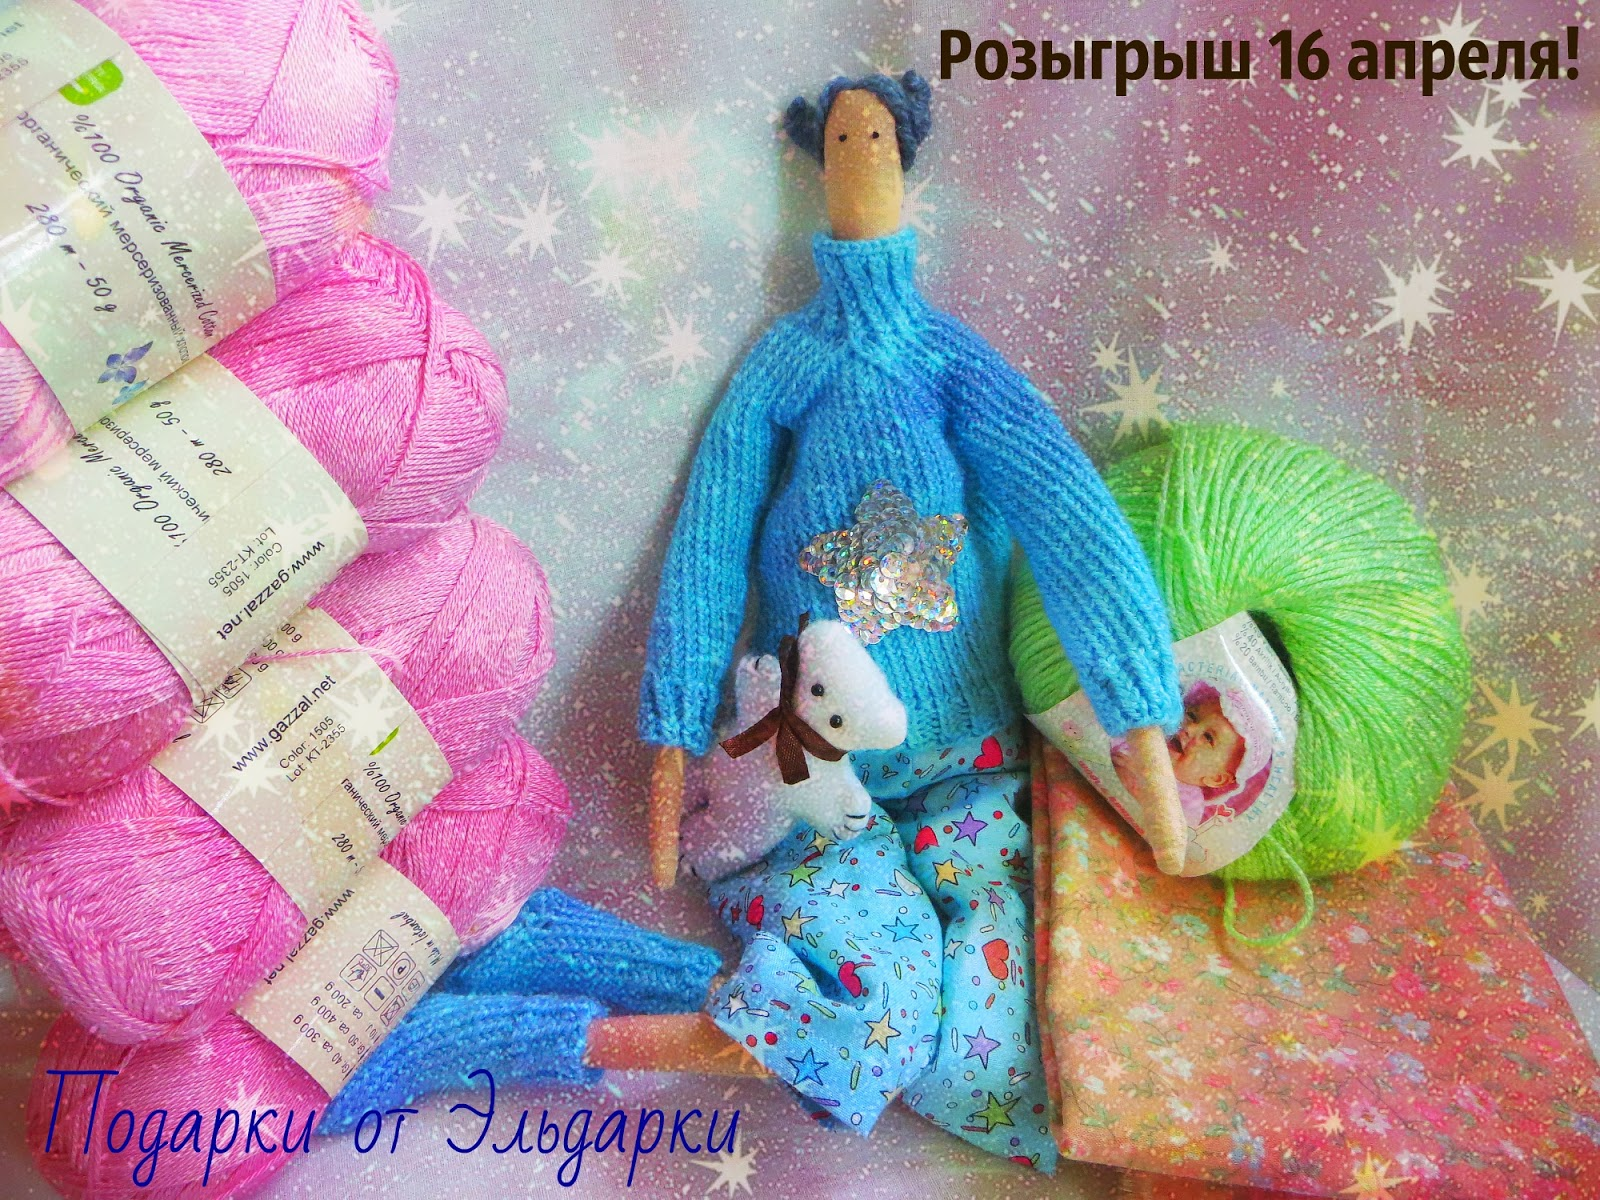 Подарки от Эльдарки